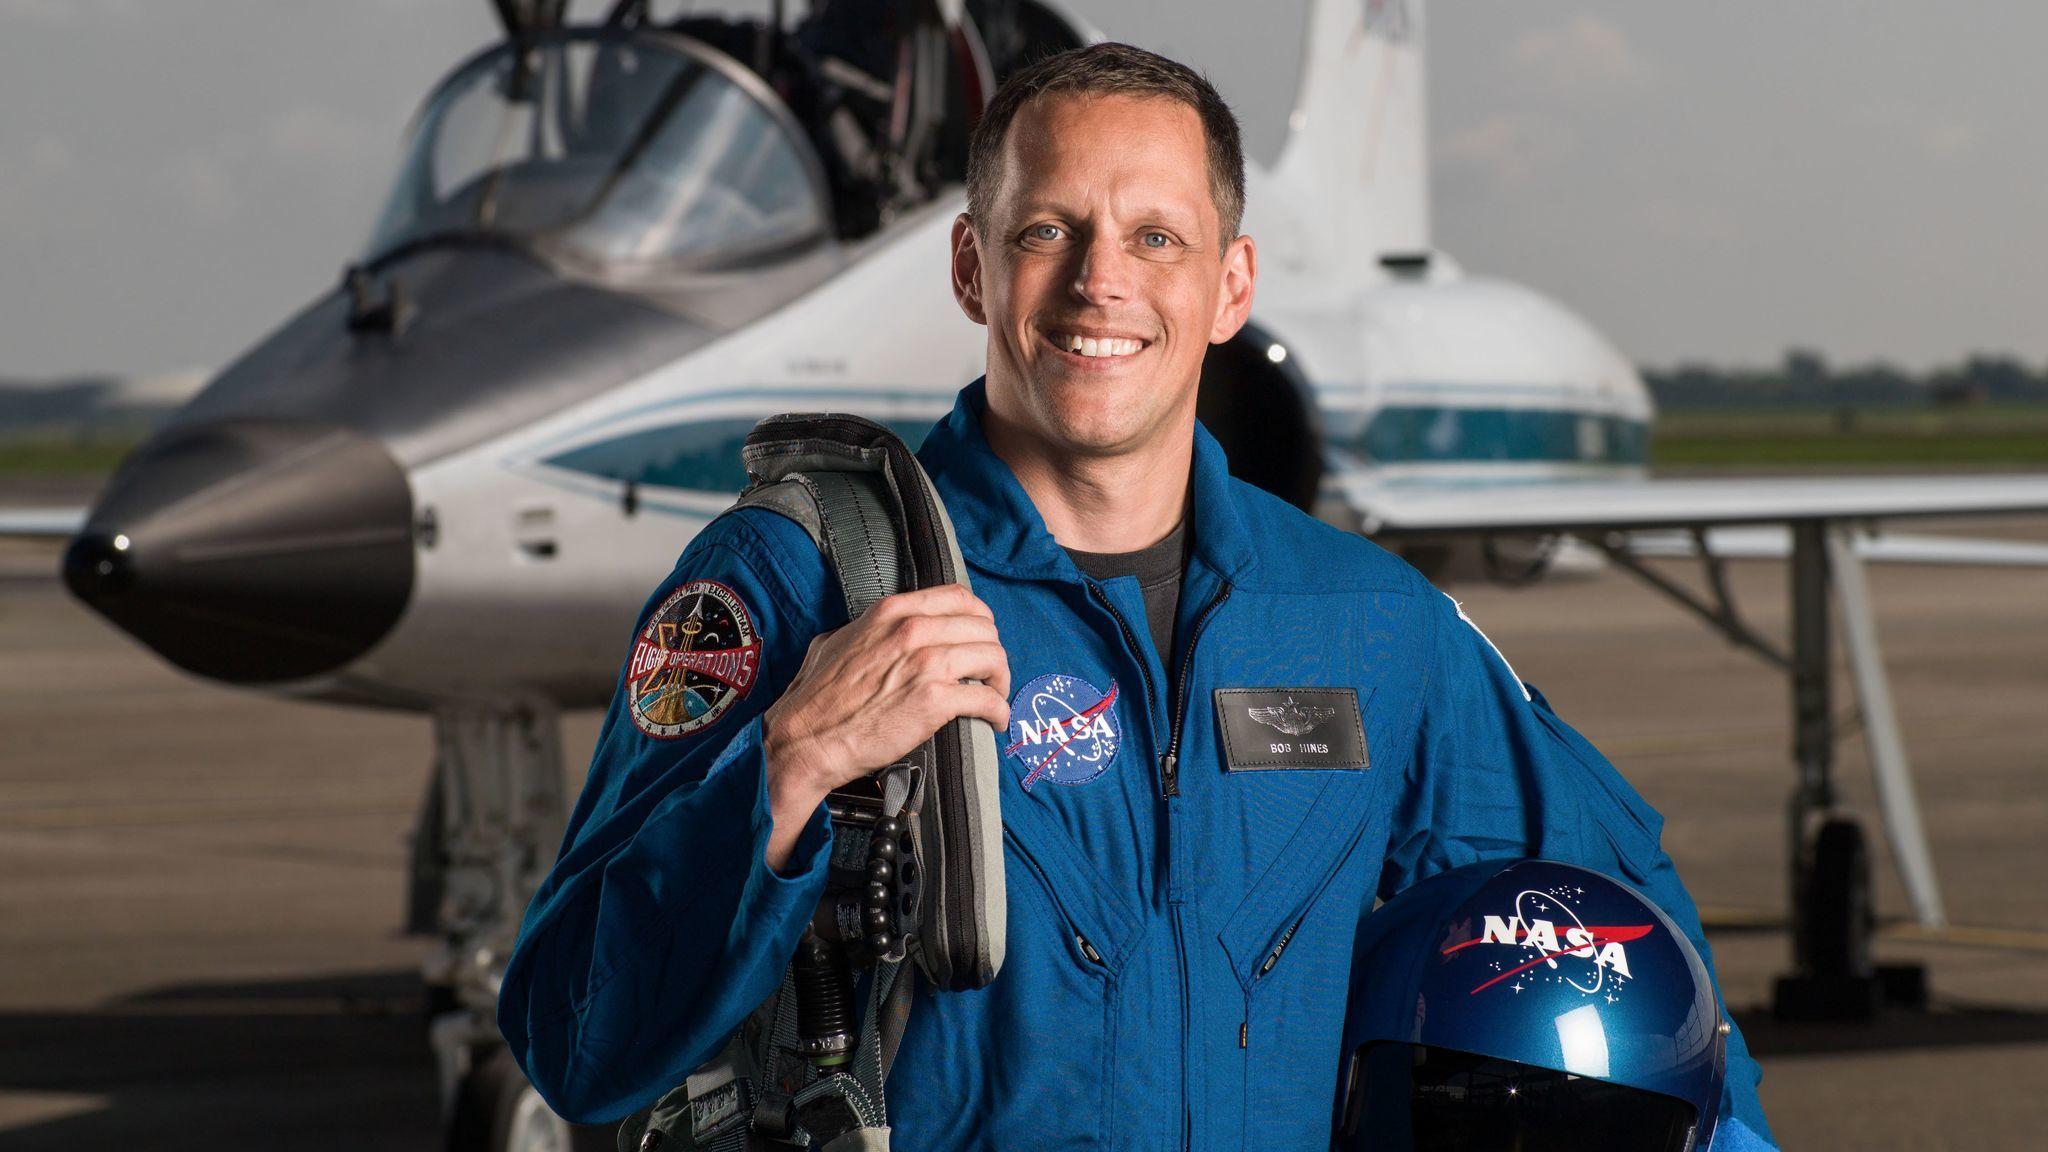 Astronaut Candidate Bob Hines